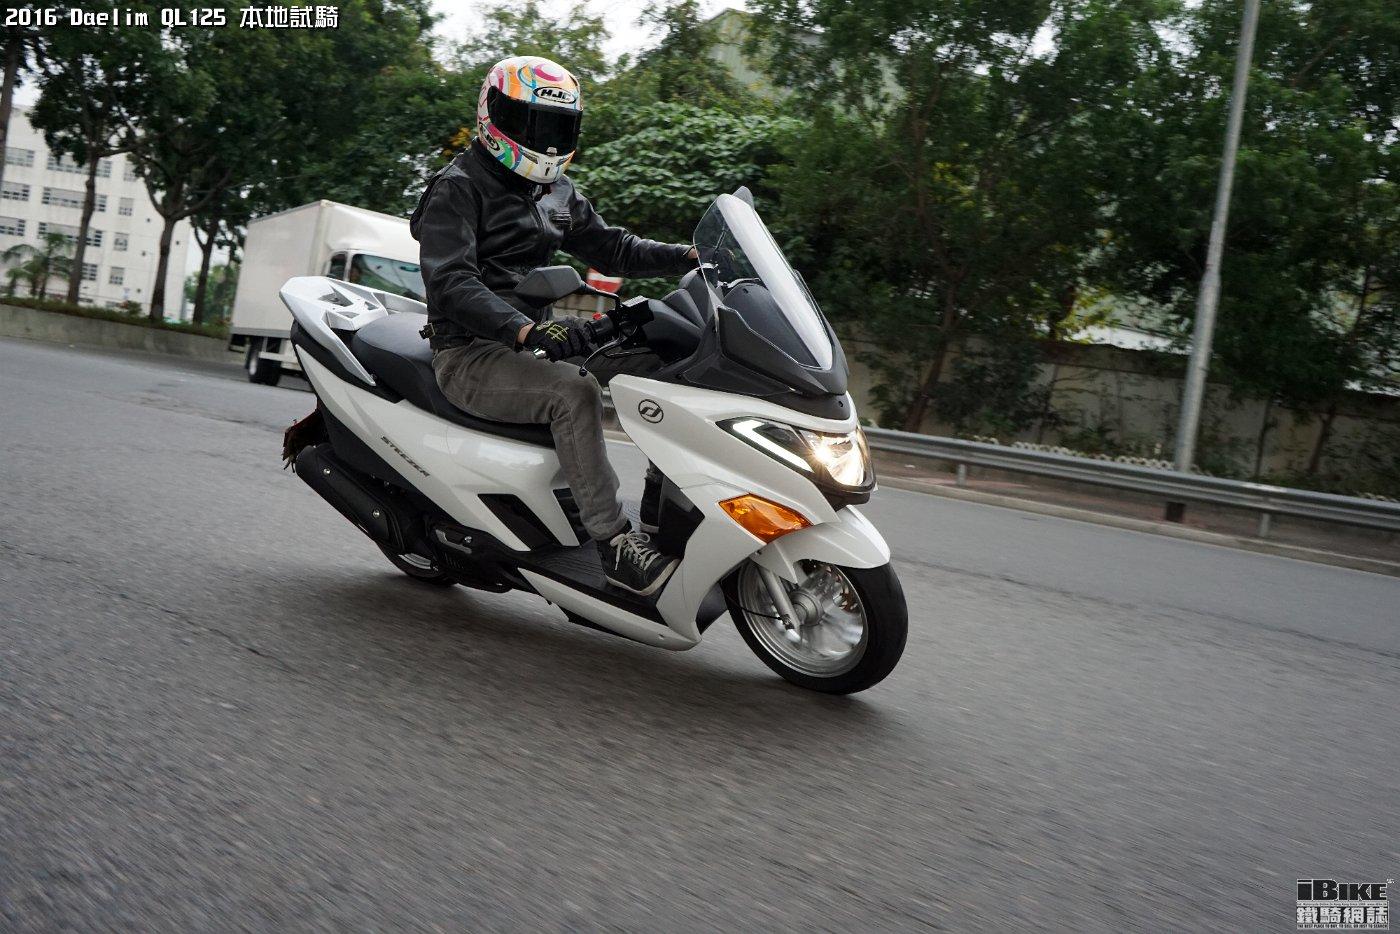 Daelim 2016 QL125 Steezer試騎介紹 - iBike鐵騎網誌 電單車資料庫